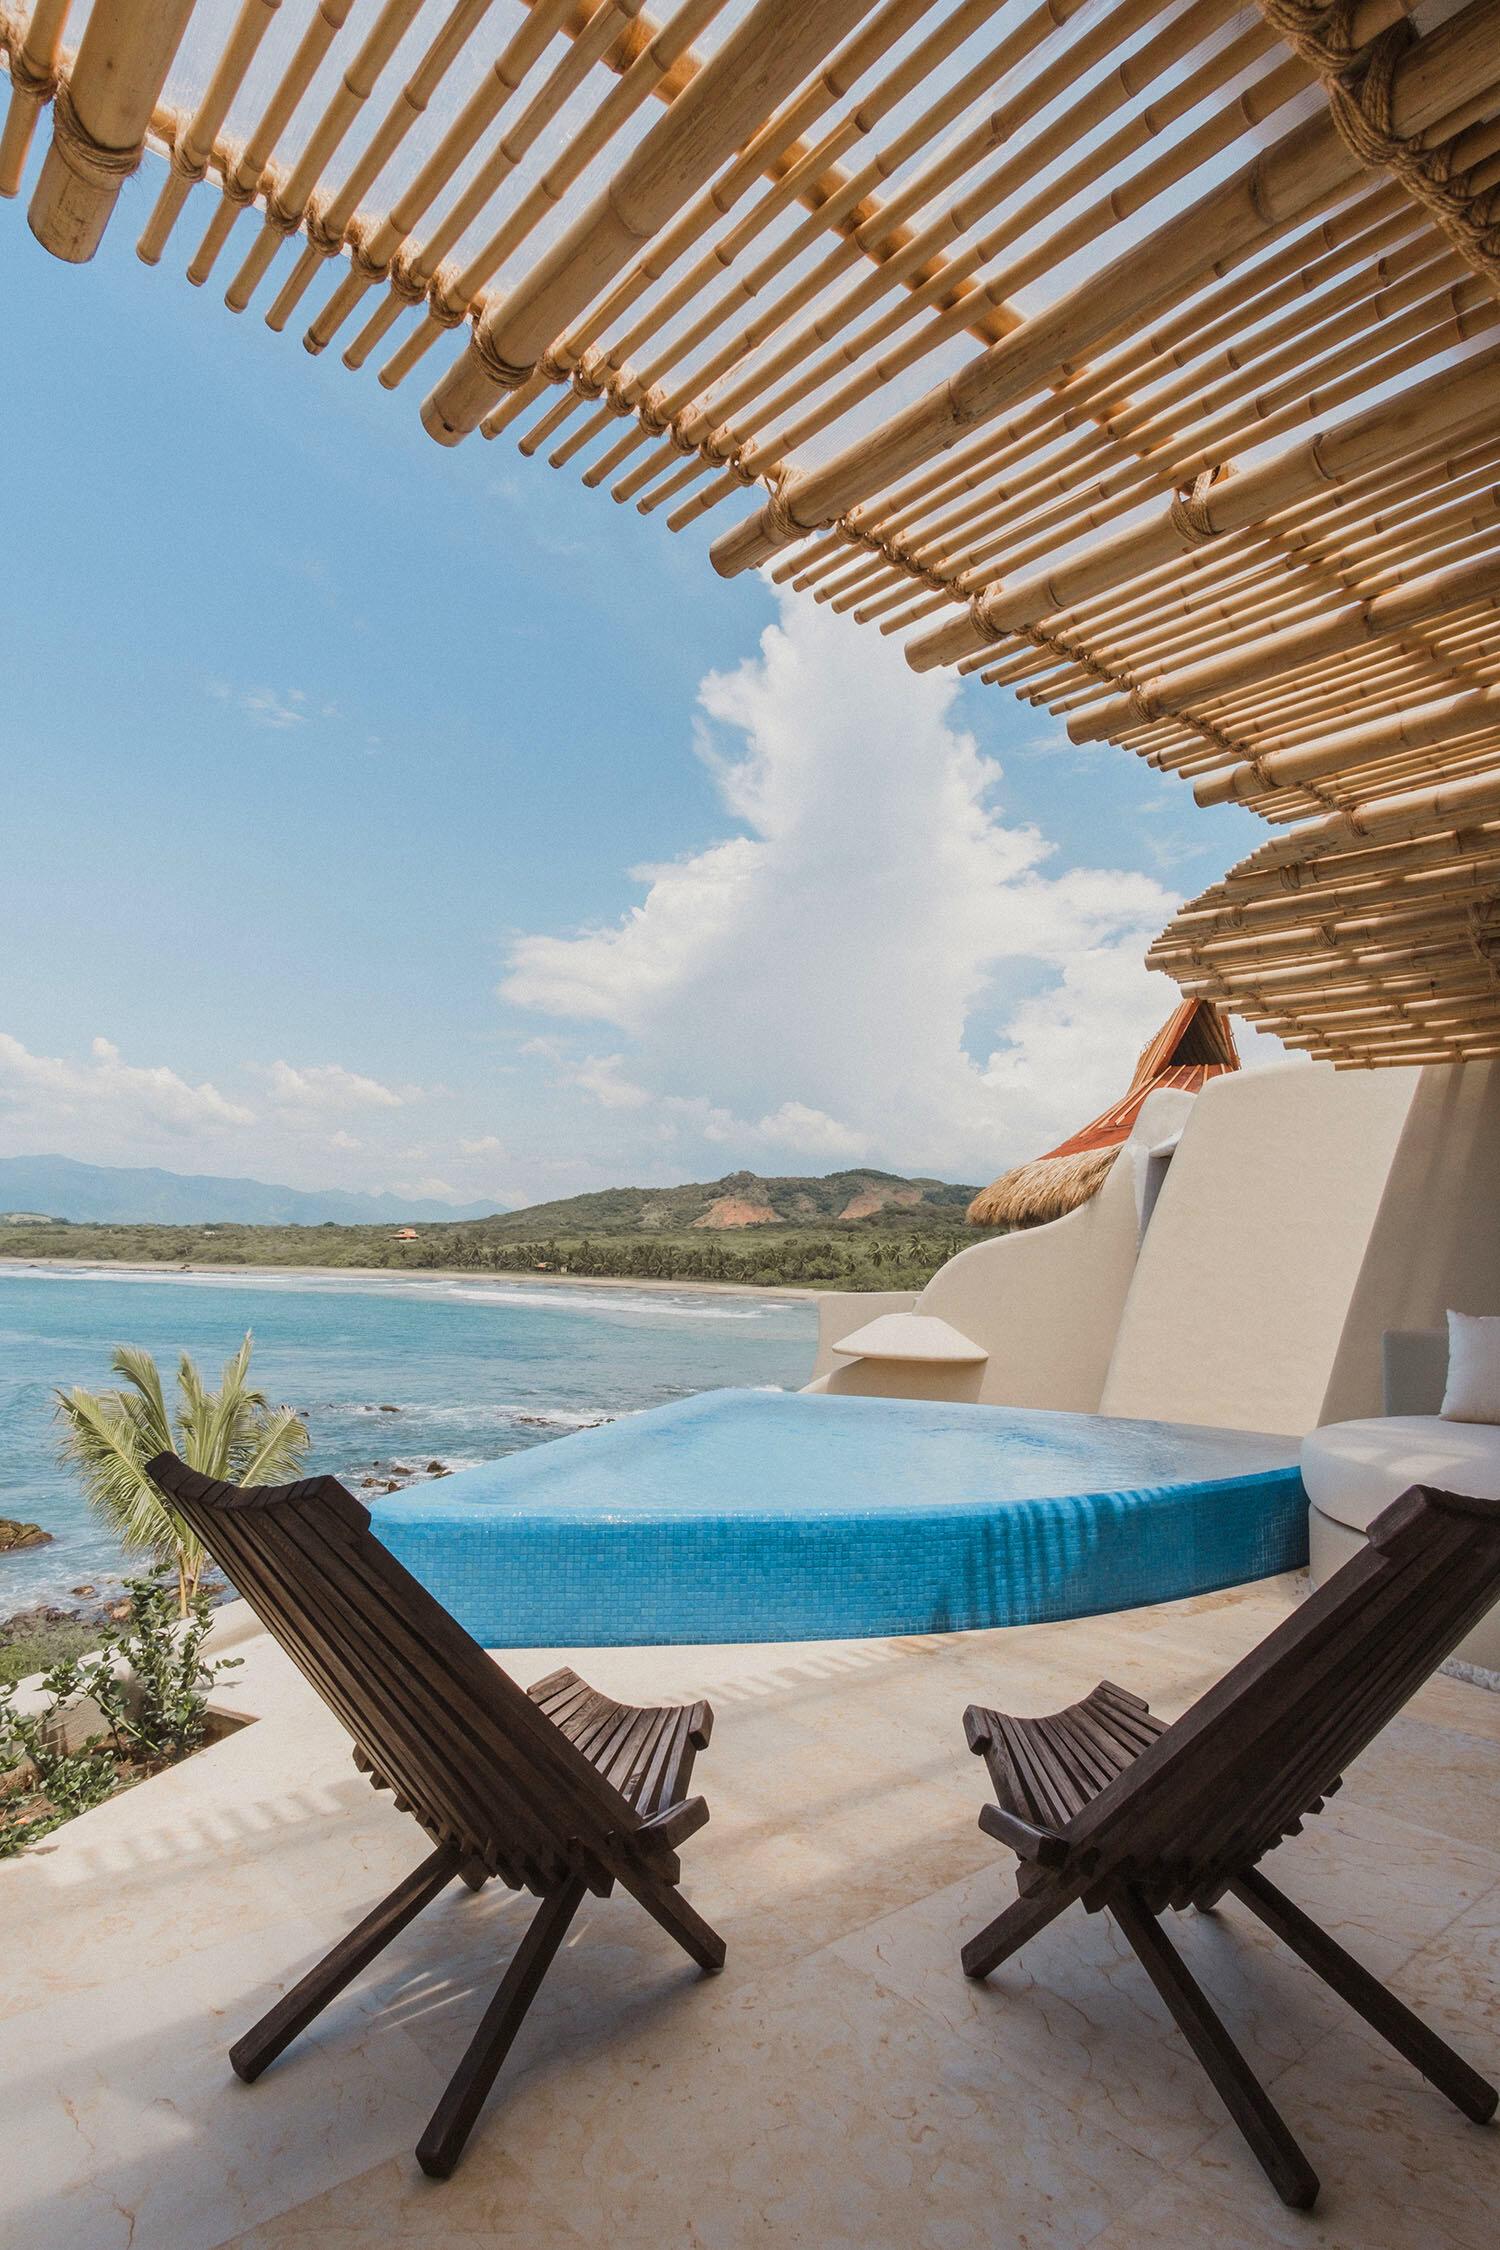 Punta-Majahua-Troncones-Ixtapa-Zihuatanejo-Zozaya-Arquitectos-Fotografia-Heiko-Bothe-15.jpg